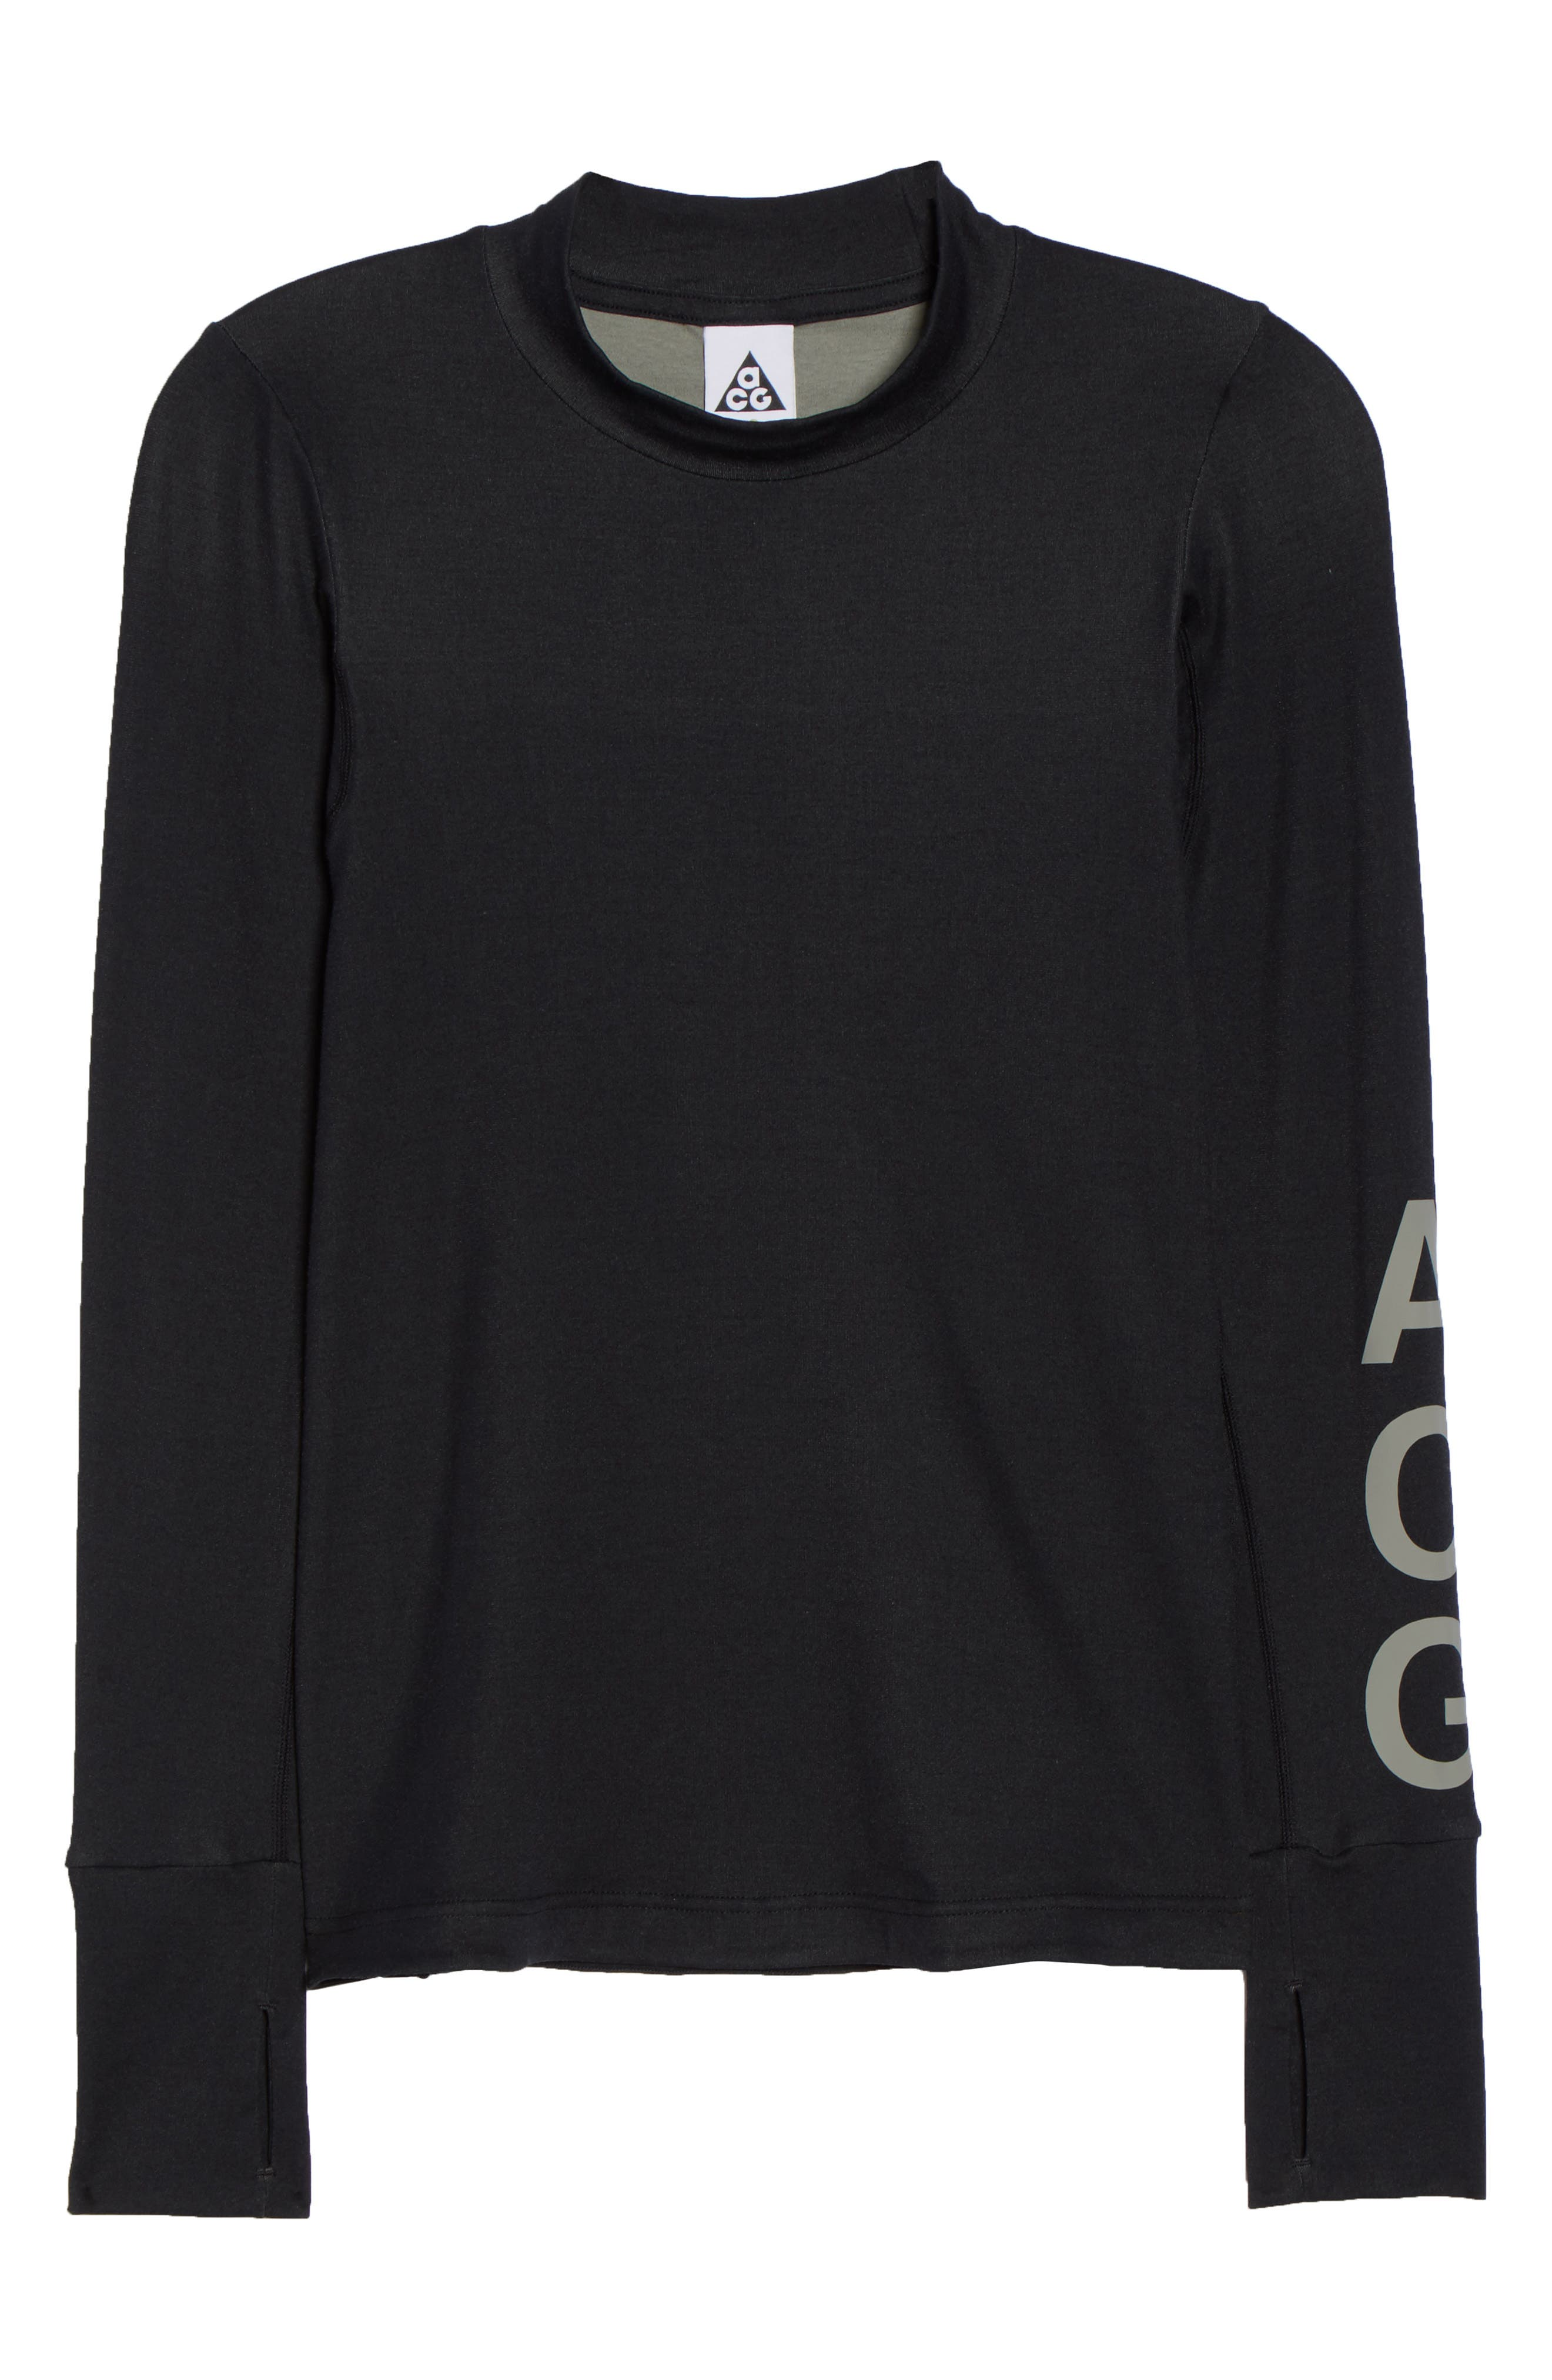 NikeLab ACG Long Sleeve Women's Top,                             Alternate thumbnail 7, color,                             010